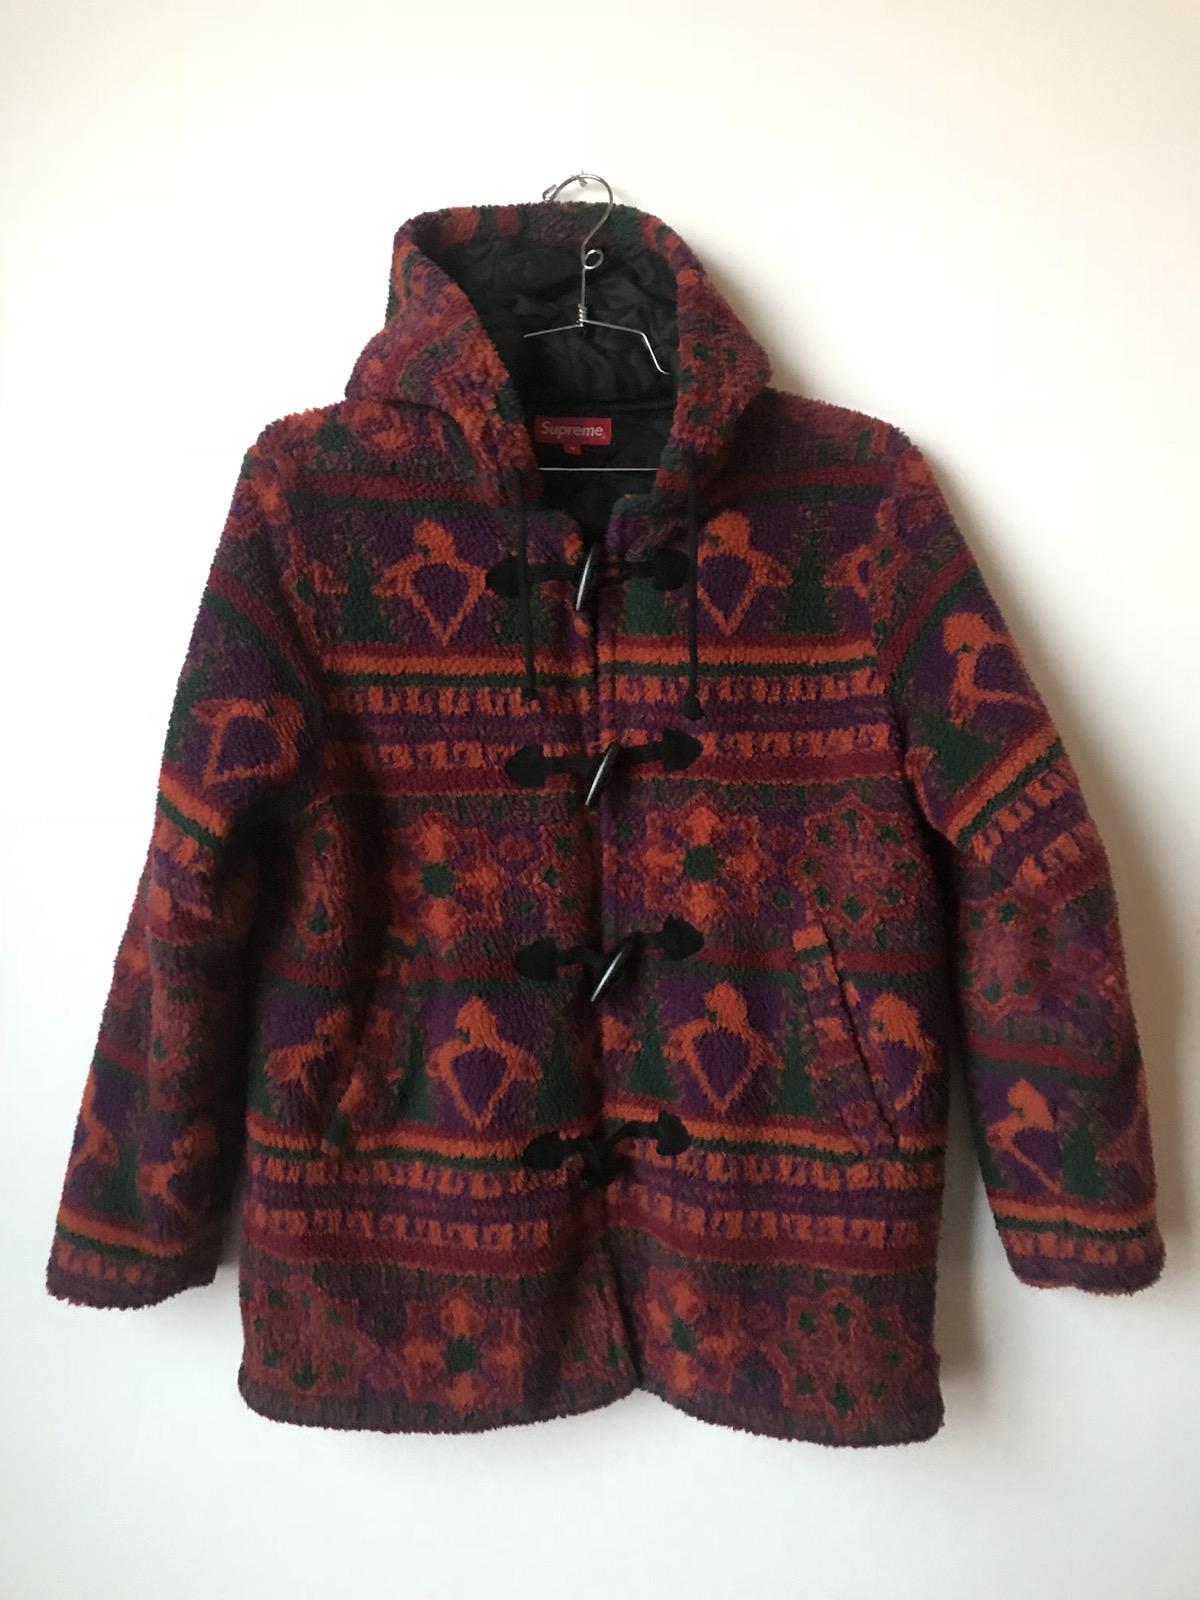 dcb67b836 Supreme Sherpa Fleece Toggle Jacket Coat Magenta Parka